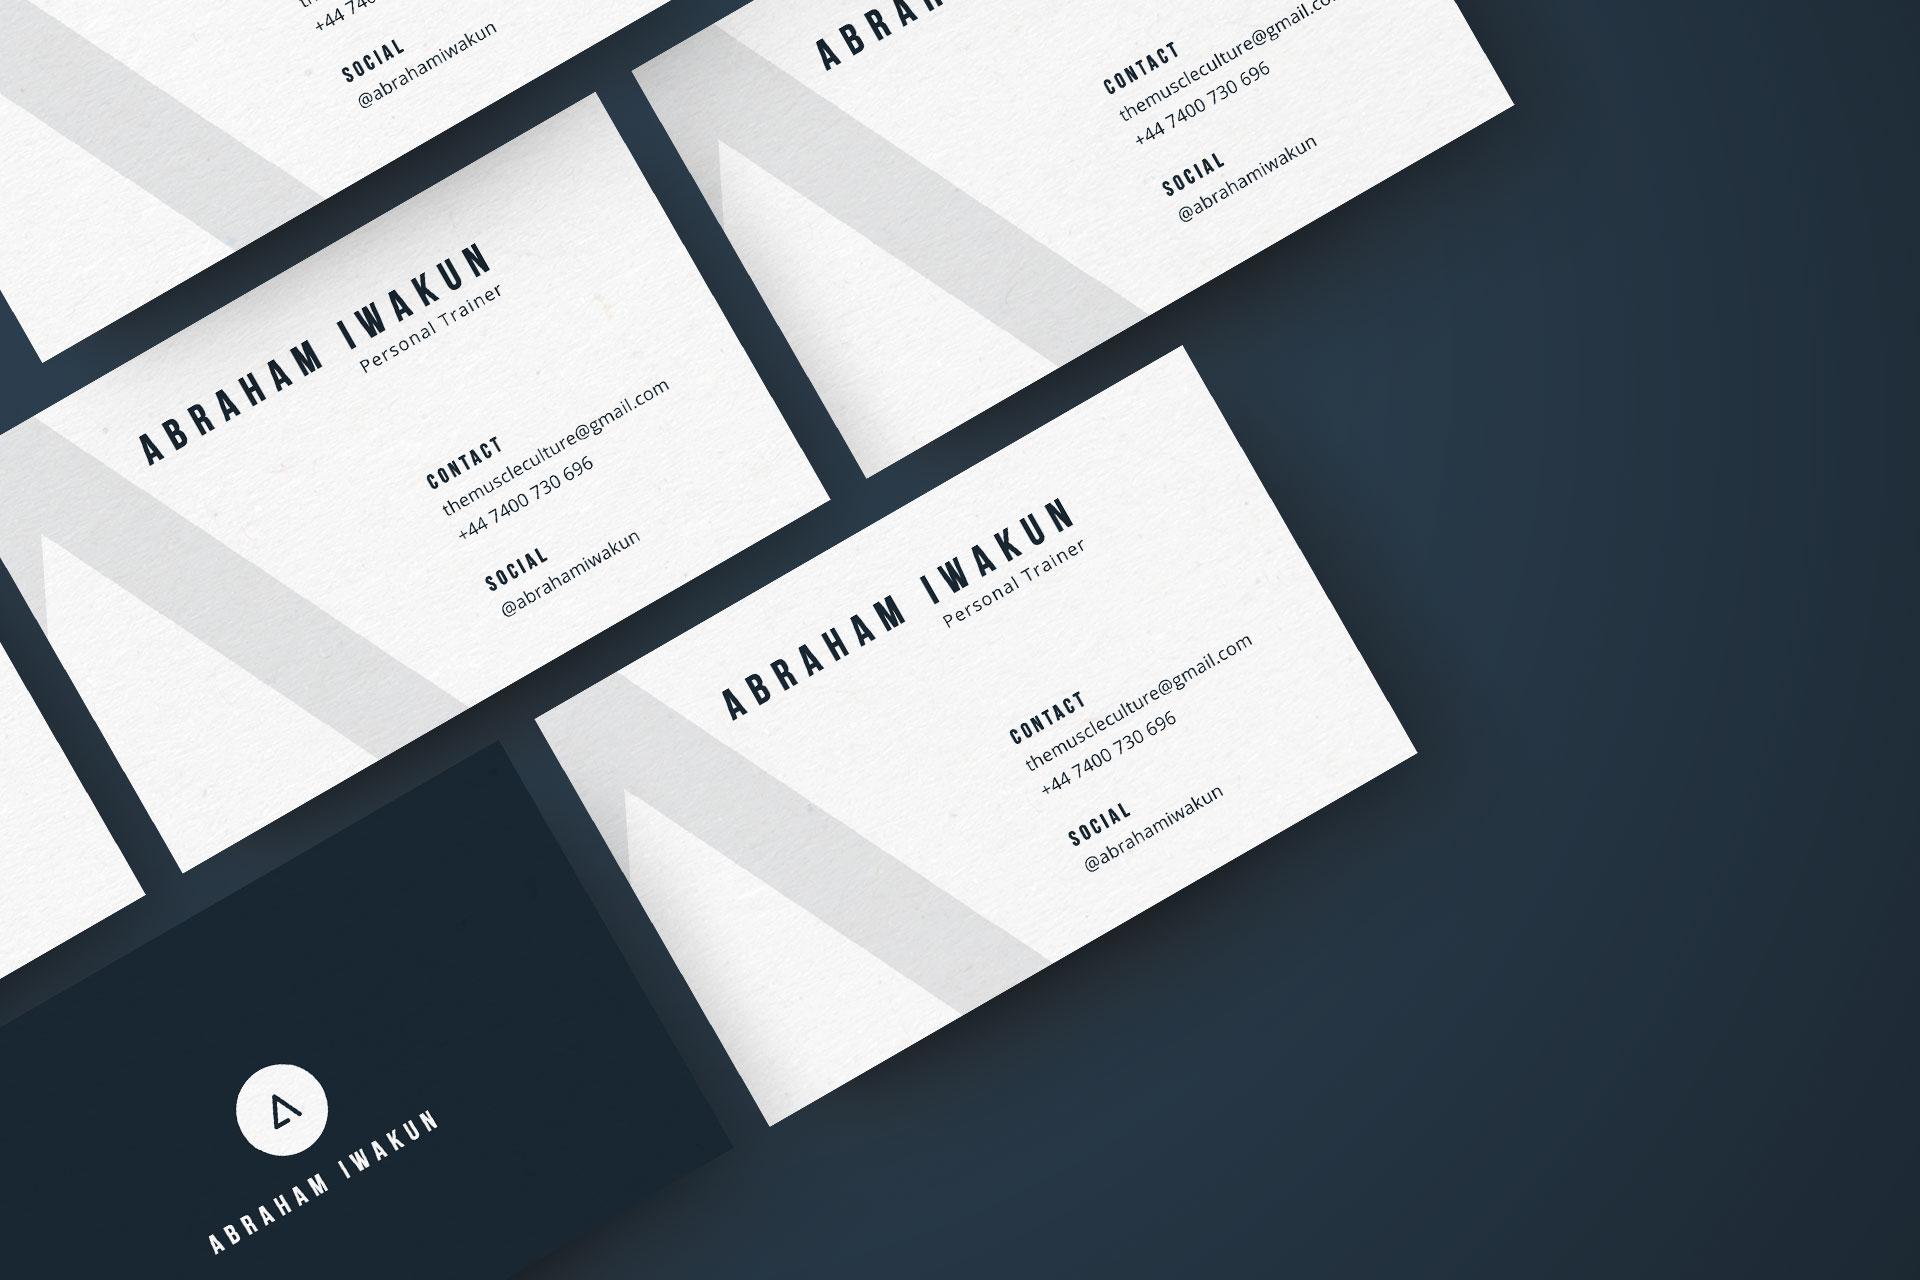 abraham-iwakun-fitness-logo-branding-business-cards-by-Orfi-Media